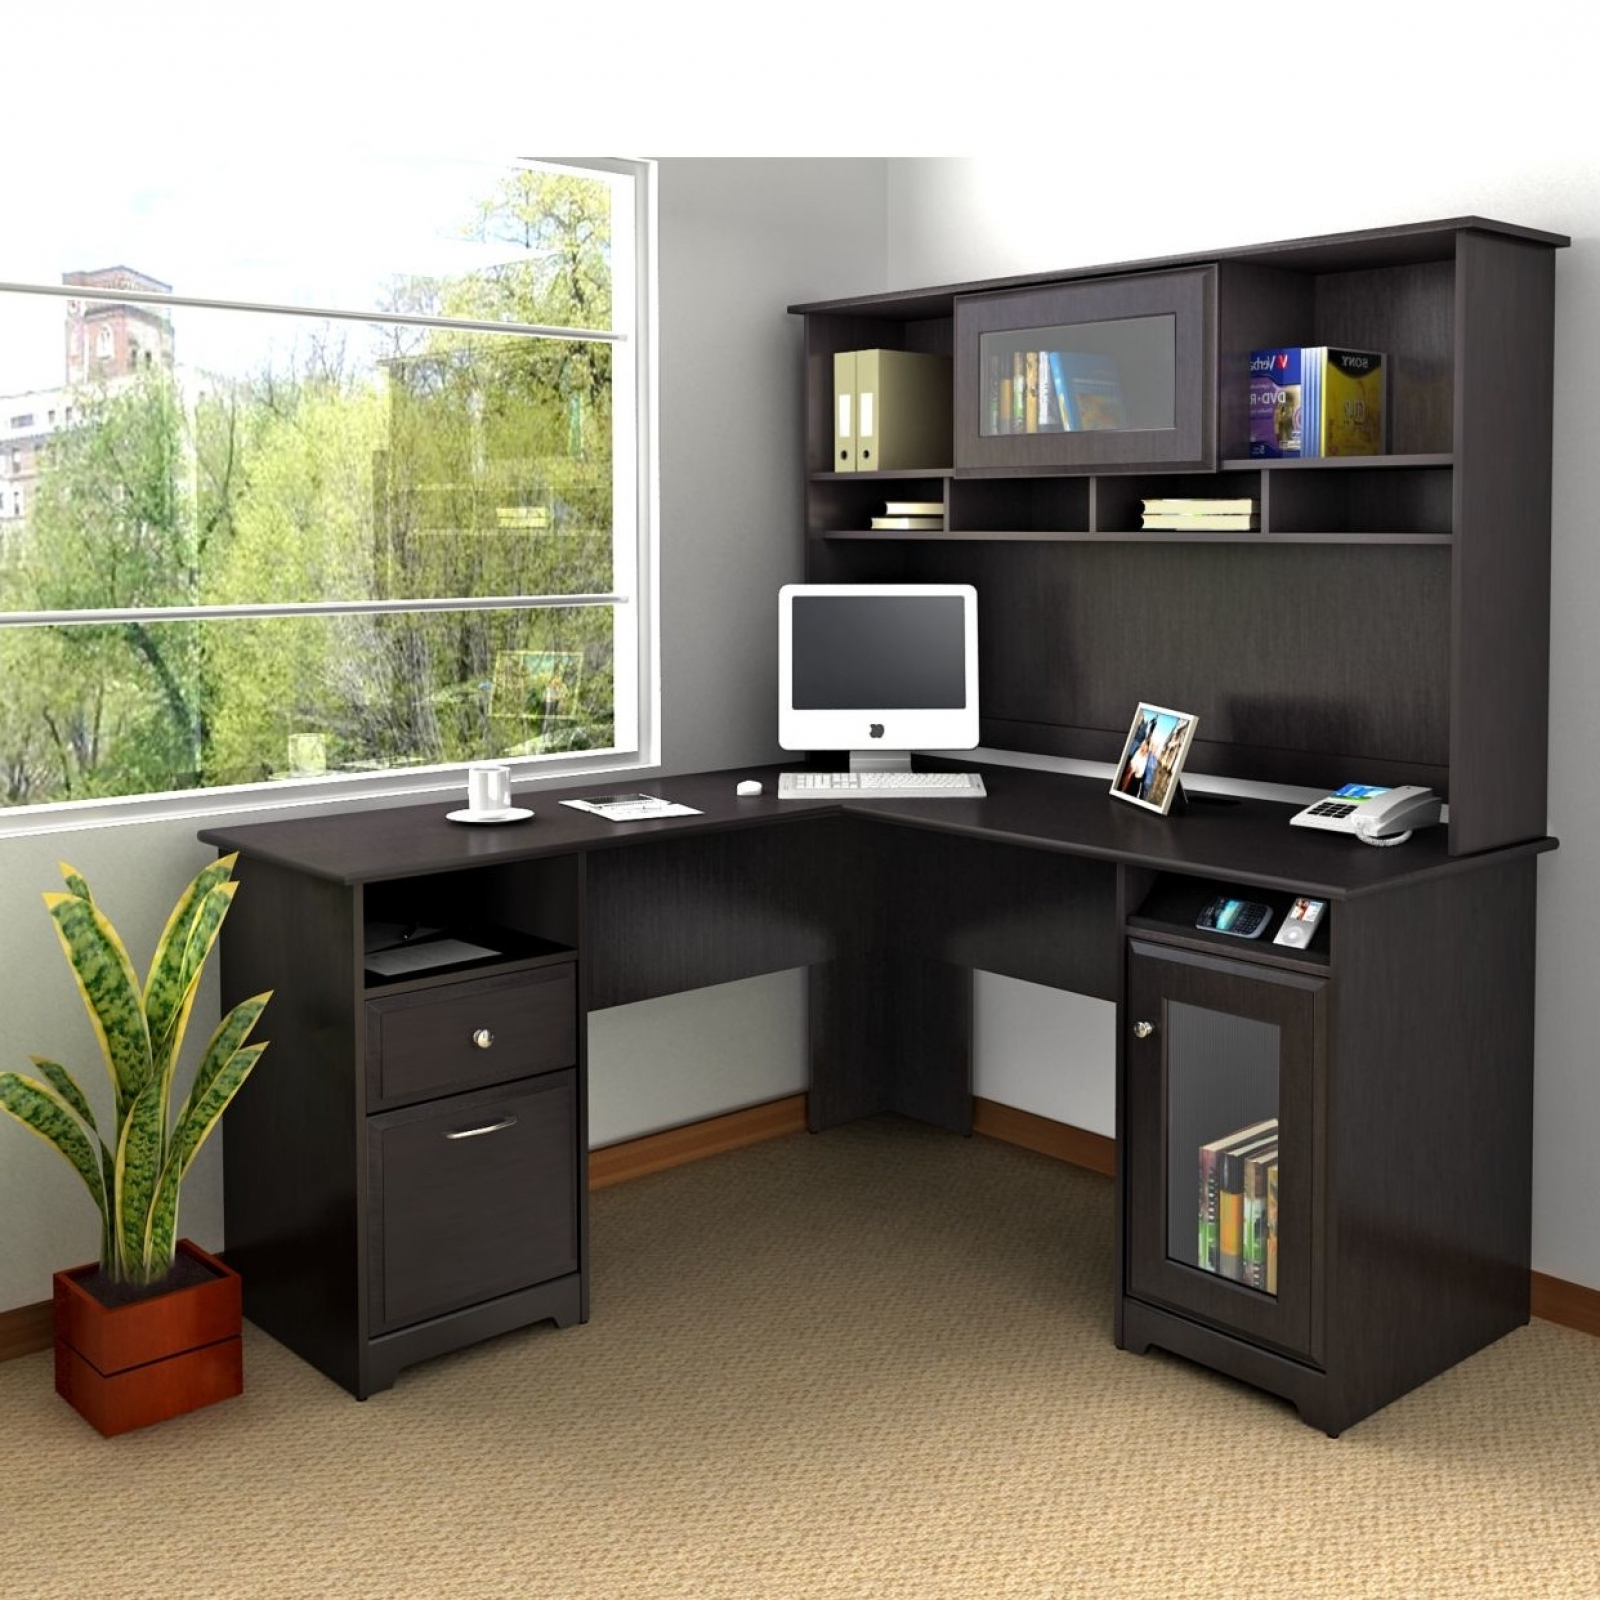 Computer Desks With Usb Ports Within Favorite Wonderful L Shape Computer Desks Desk L Shaped Computer Desks For (View 4 of 20)